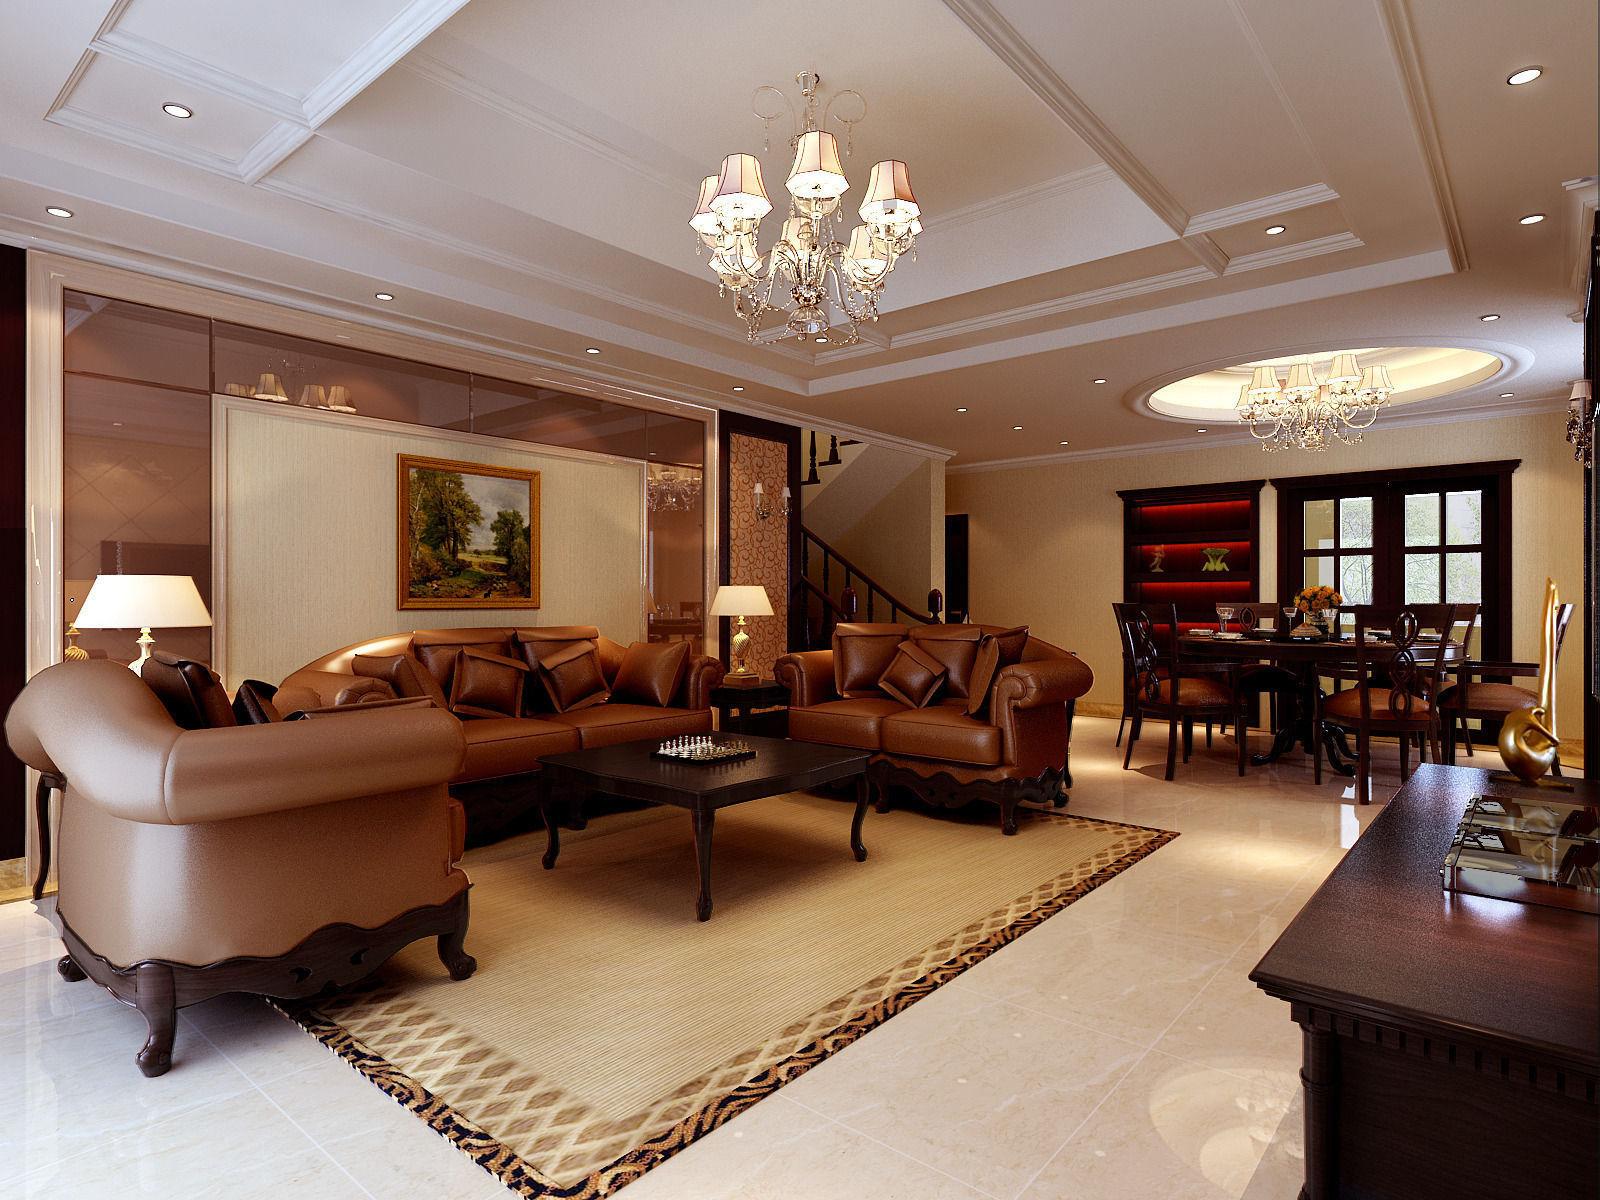 European Style Living Room 14 3d Model Max